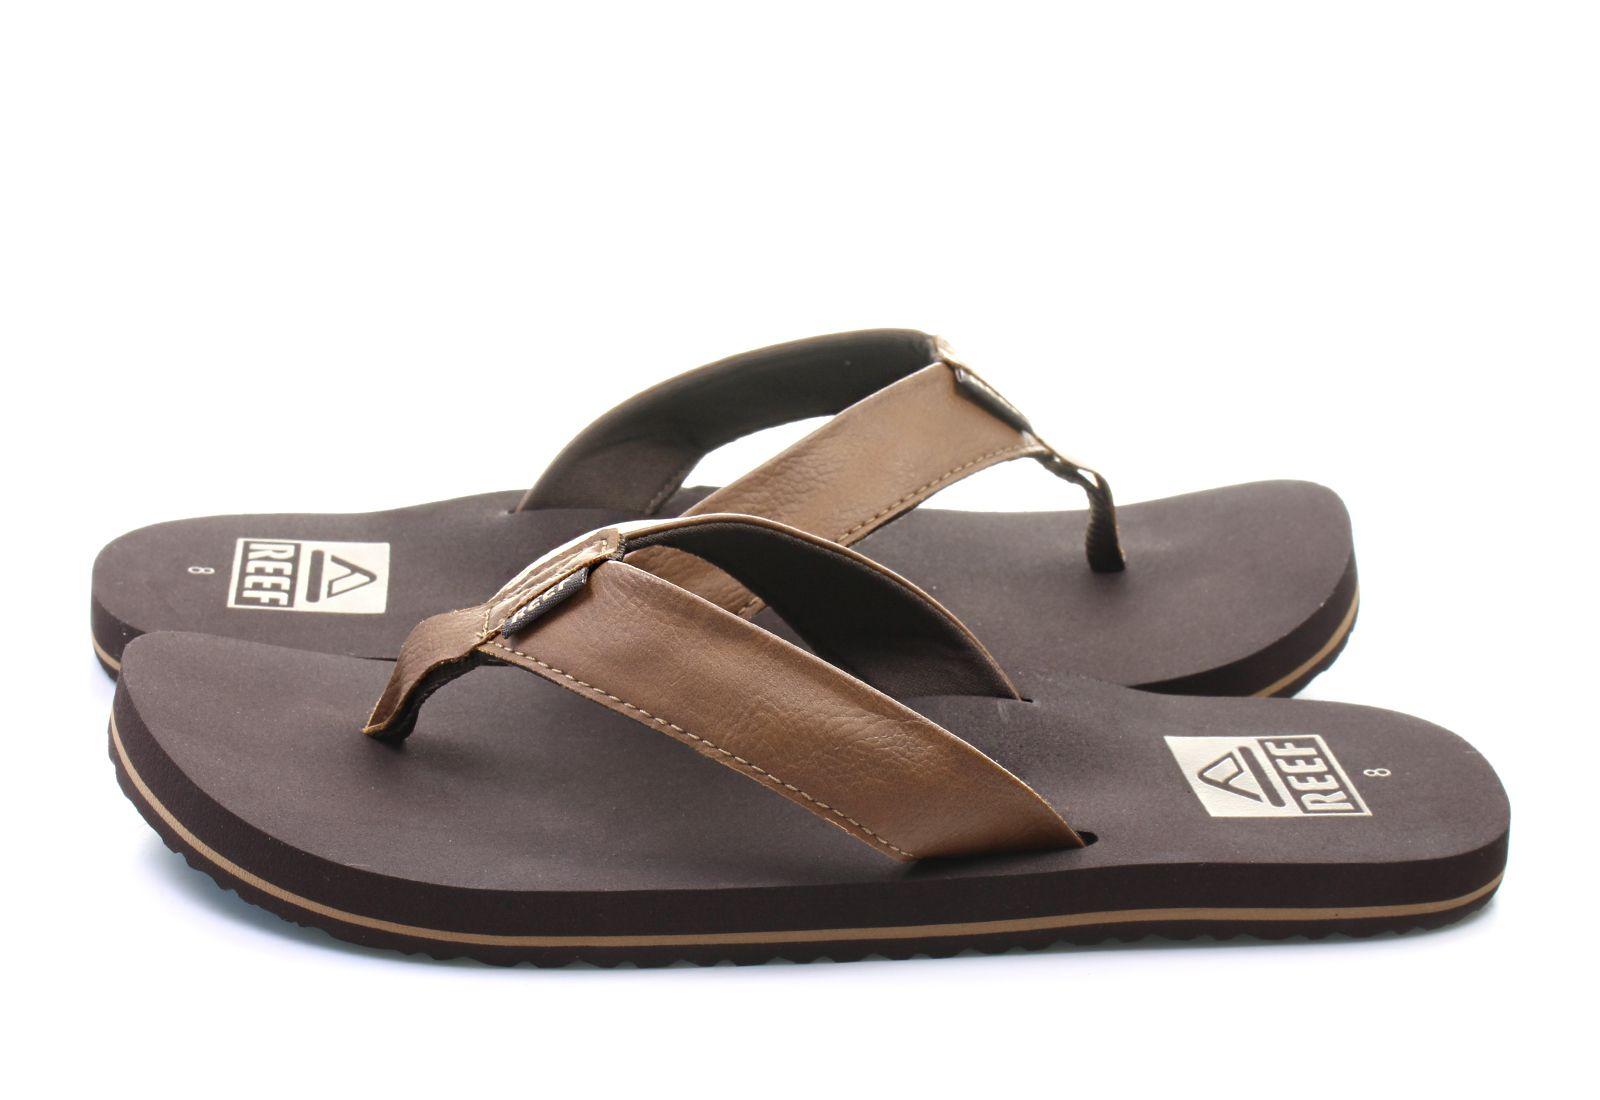 reef slippers - reef twinpin - r2915bro - online shop for sneakers